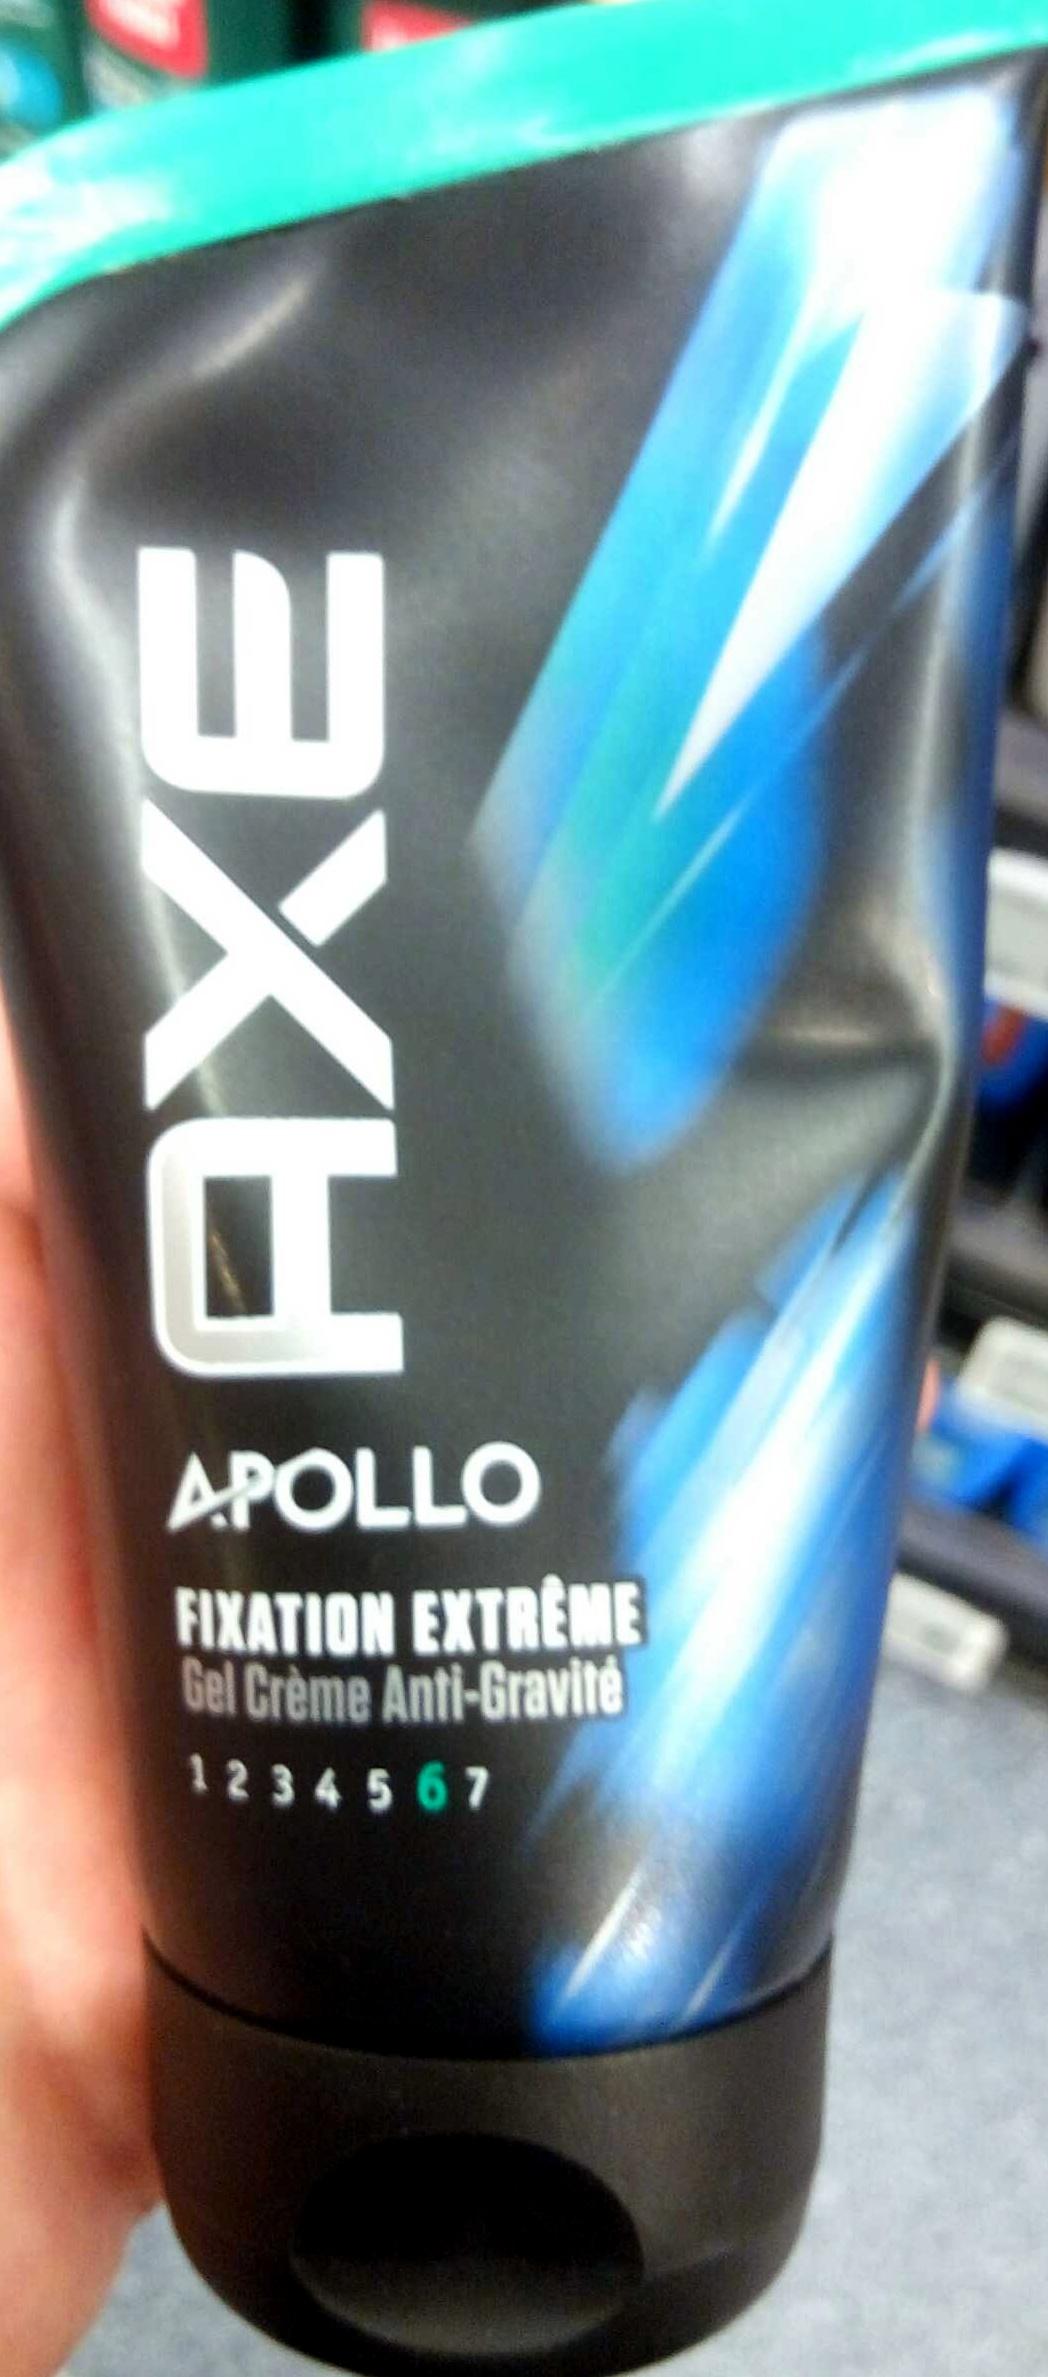 AXE Adrenaline GEL CHEVEUX Fixation Extrême Tube - Product - fr